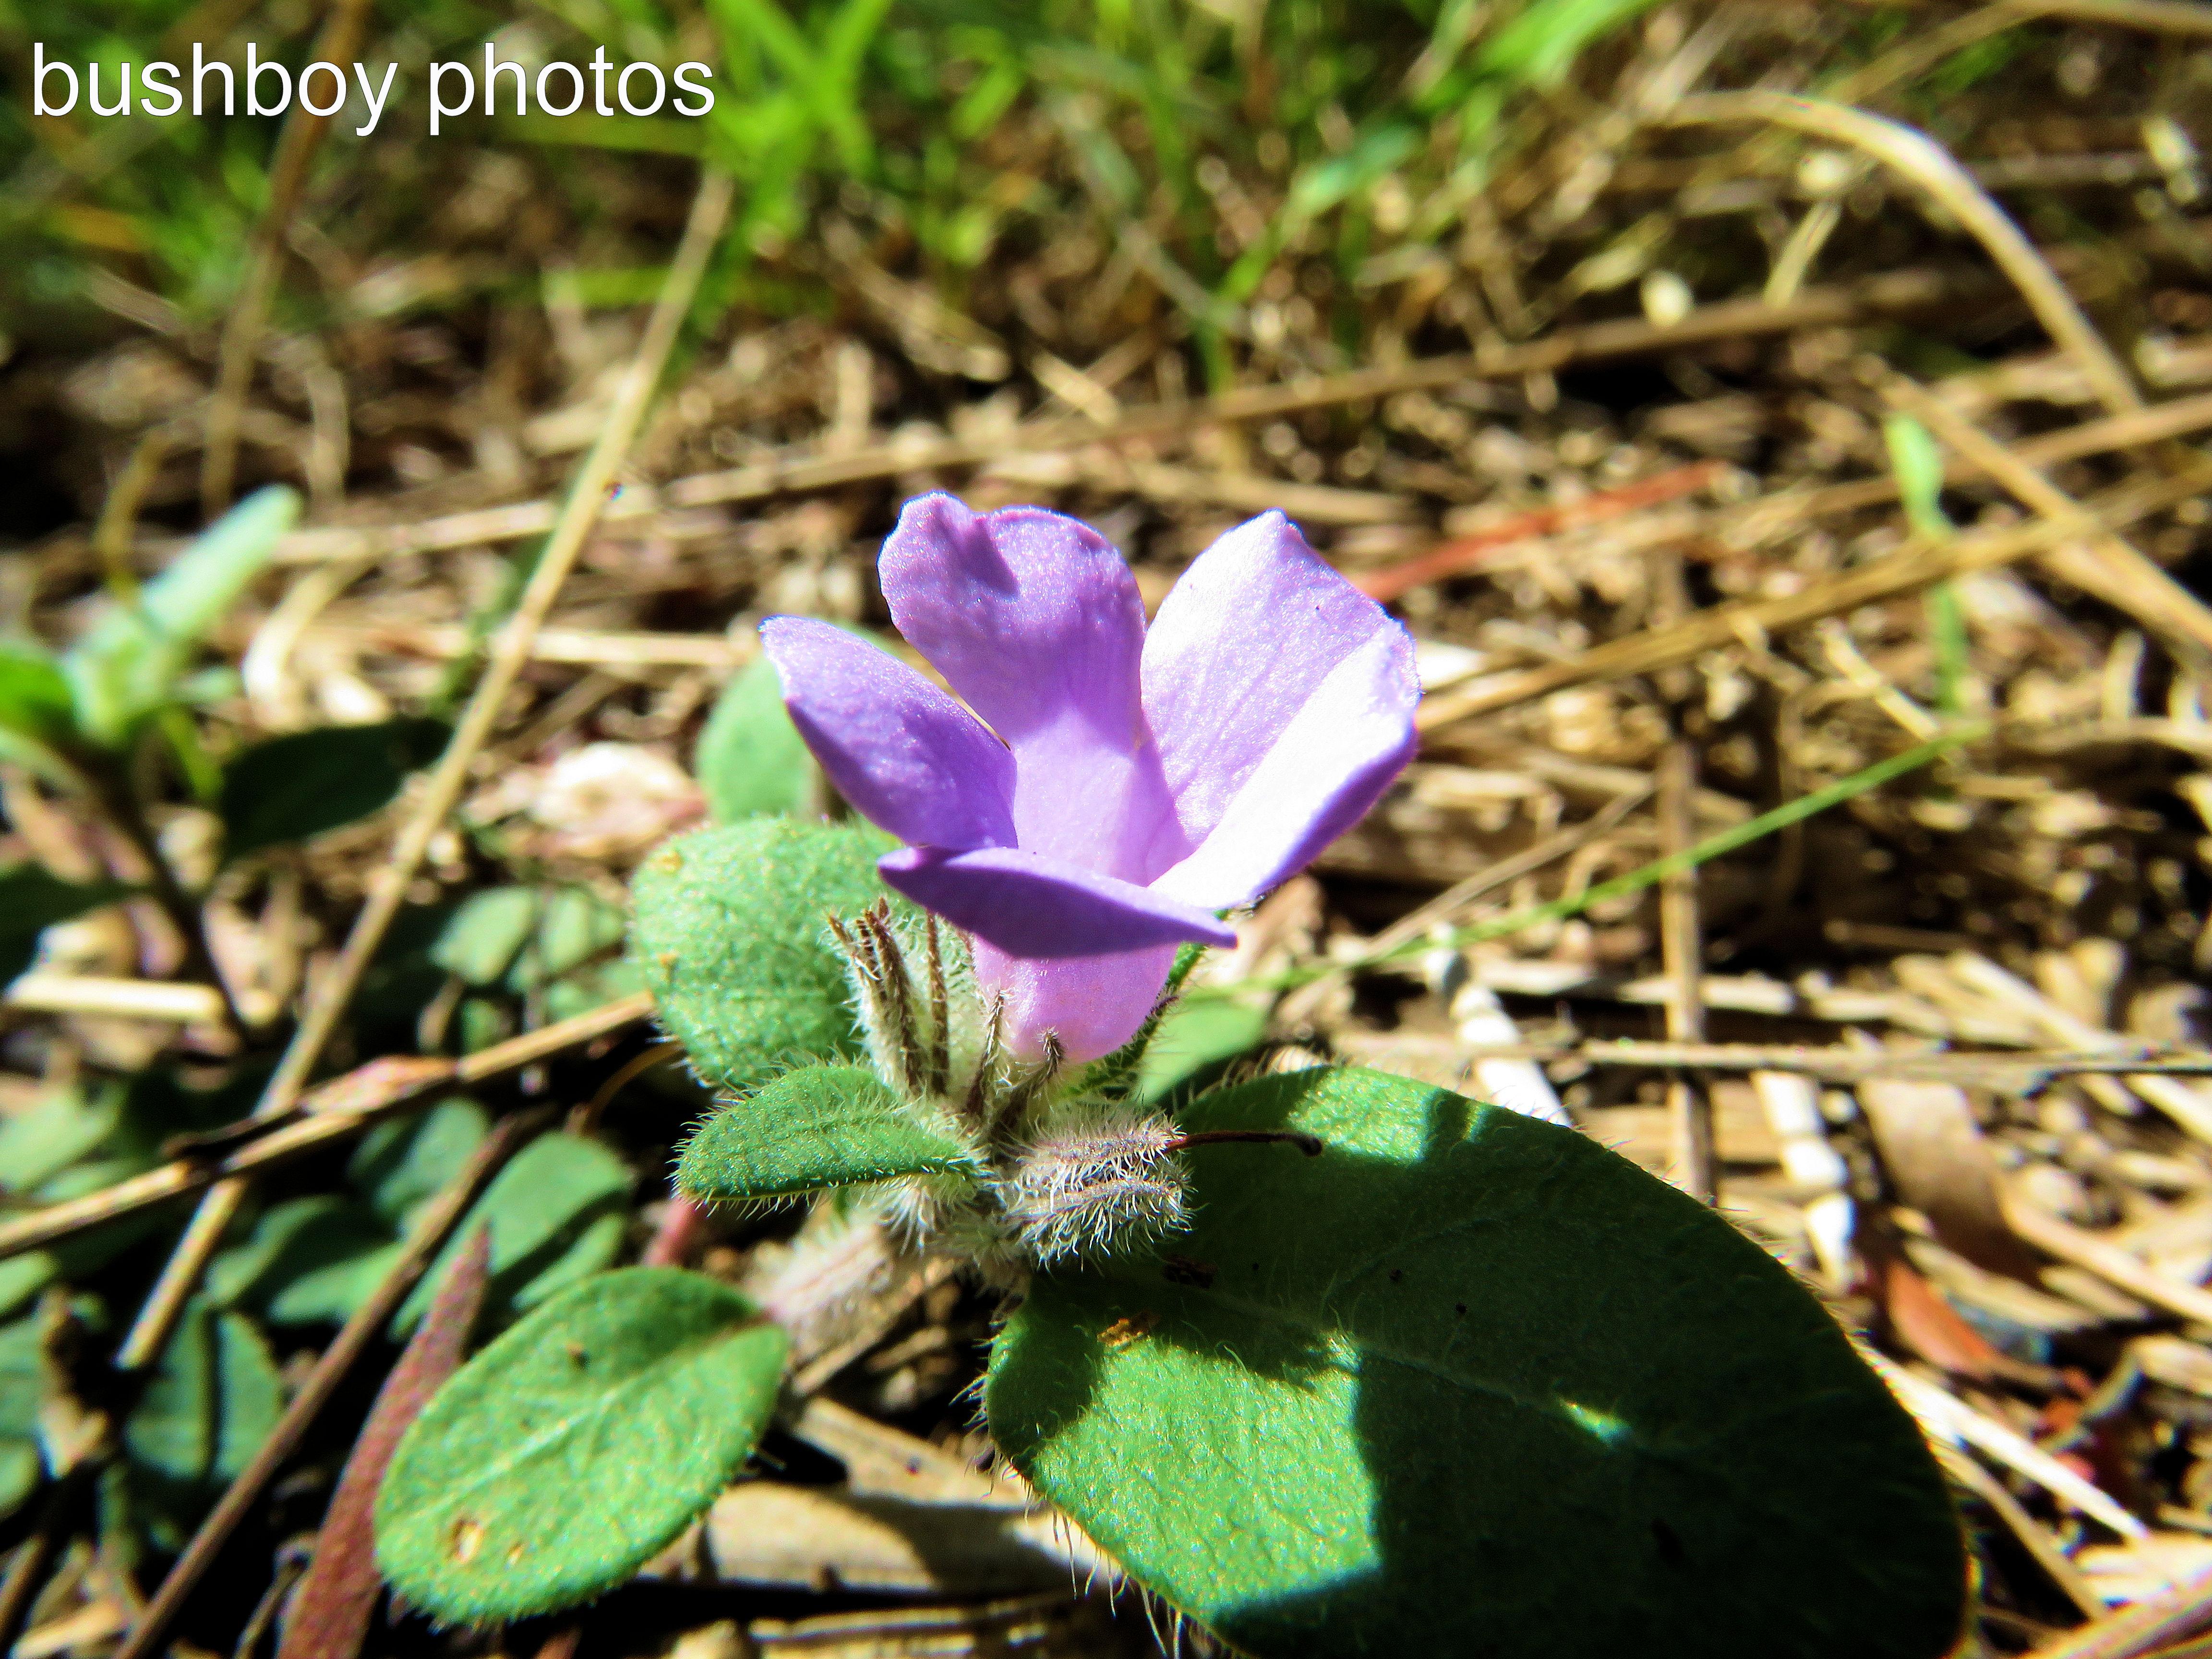 purple-hairy-flower_named_home_feb-2017